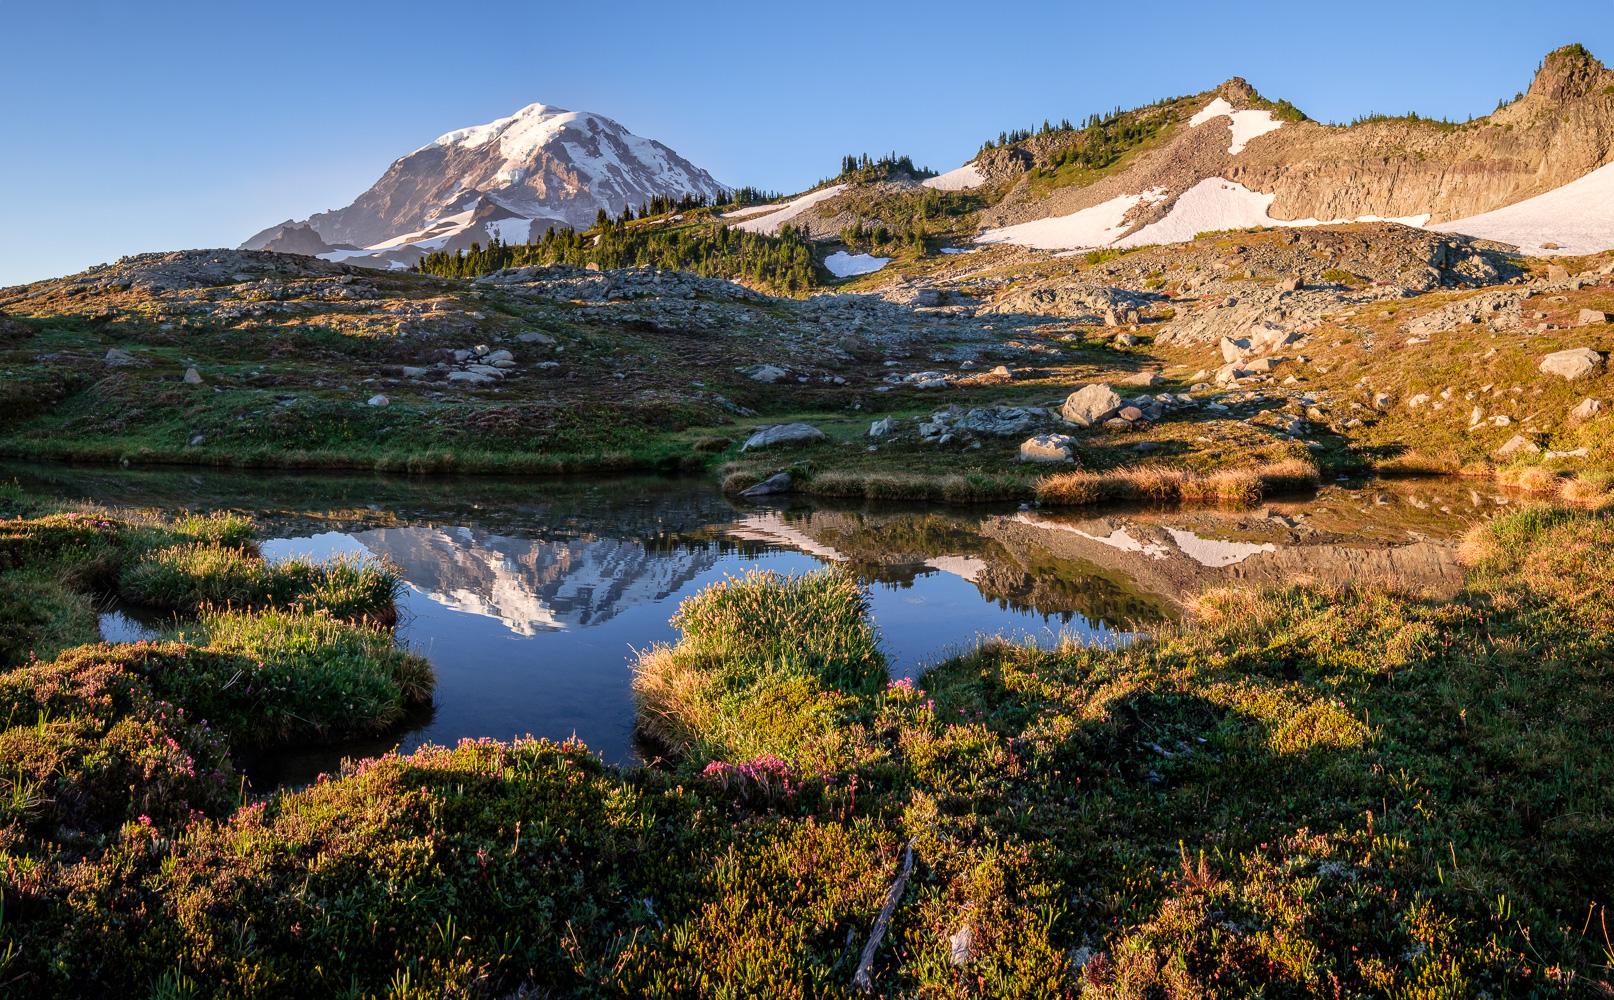 A small tarn beneath Knapsack Pass reflects Mount Rainier